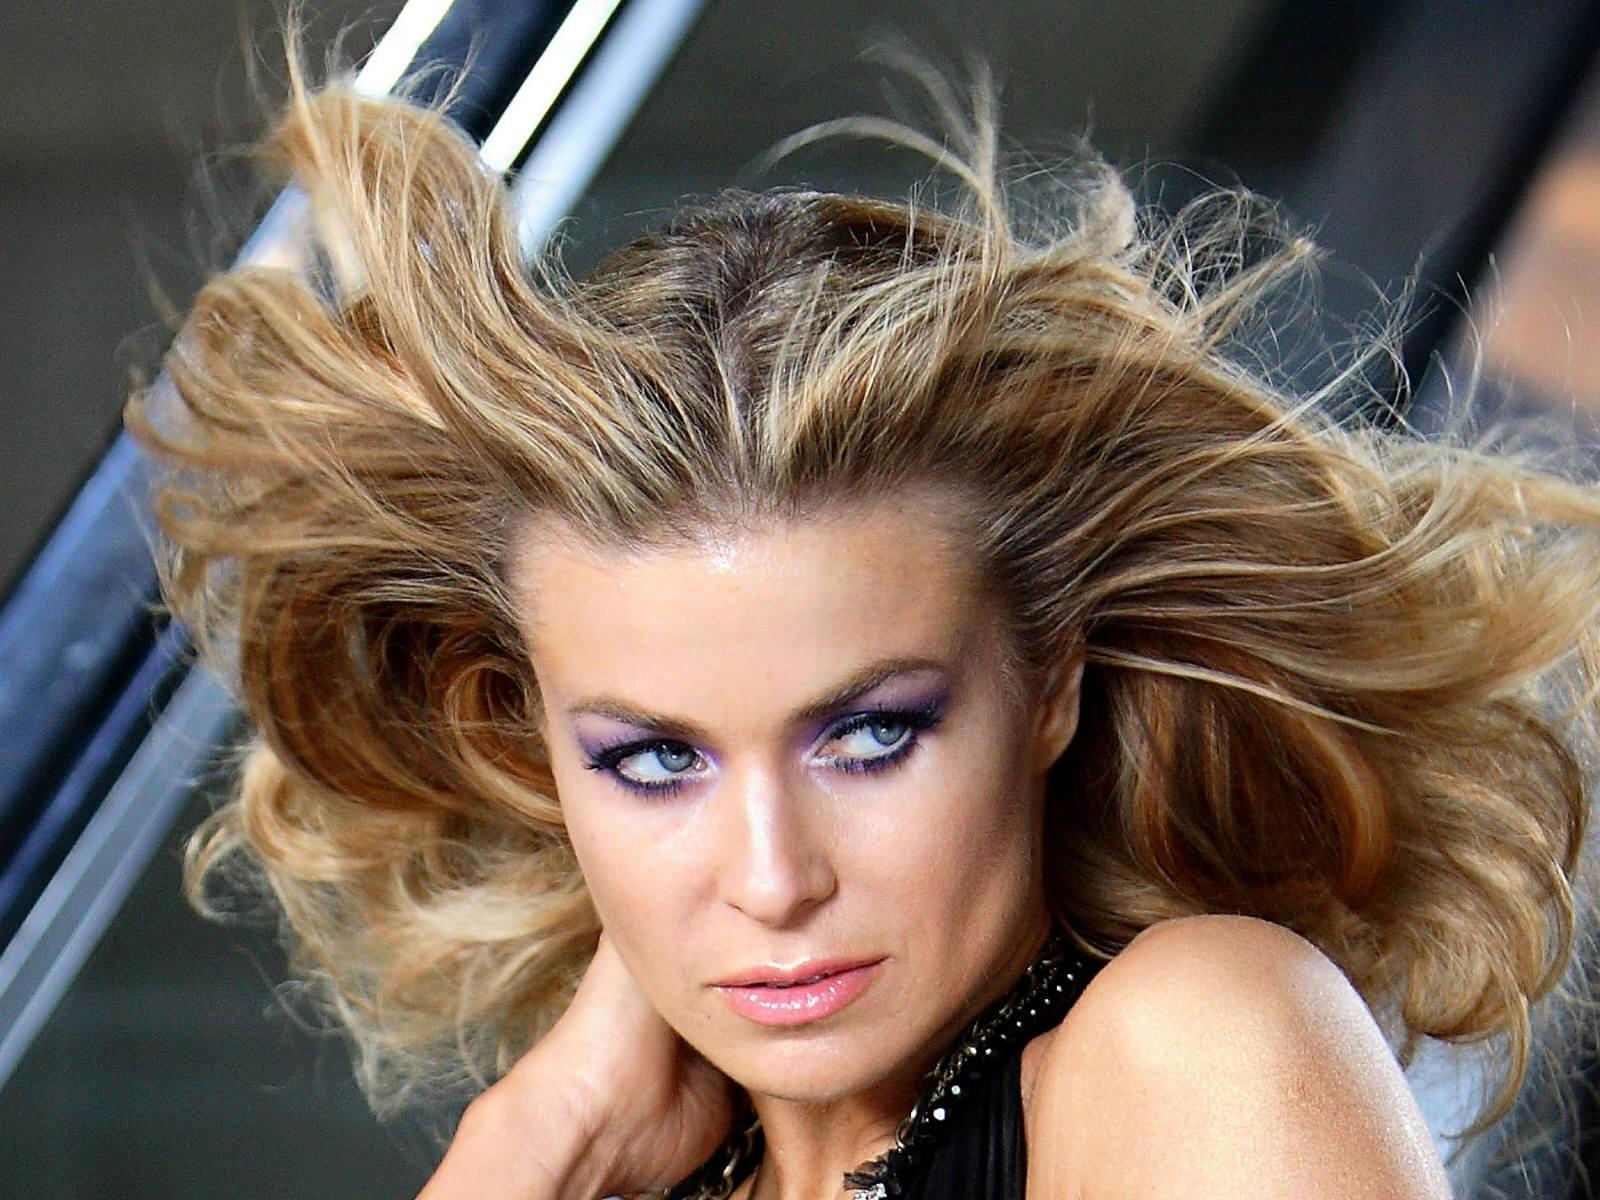 Wallpaper - capelli al vento per Carmen Electra